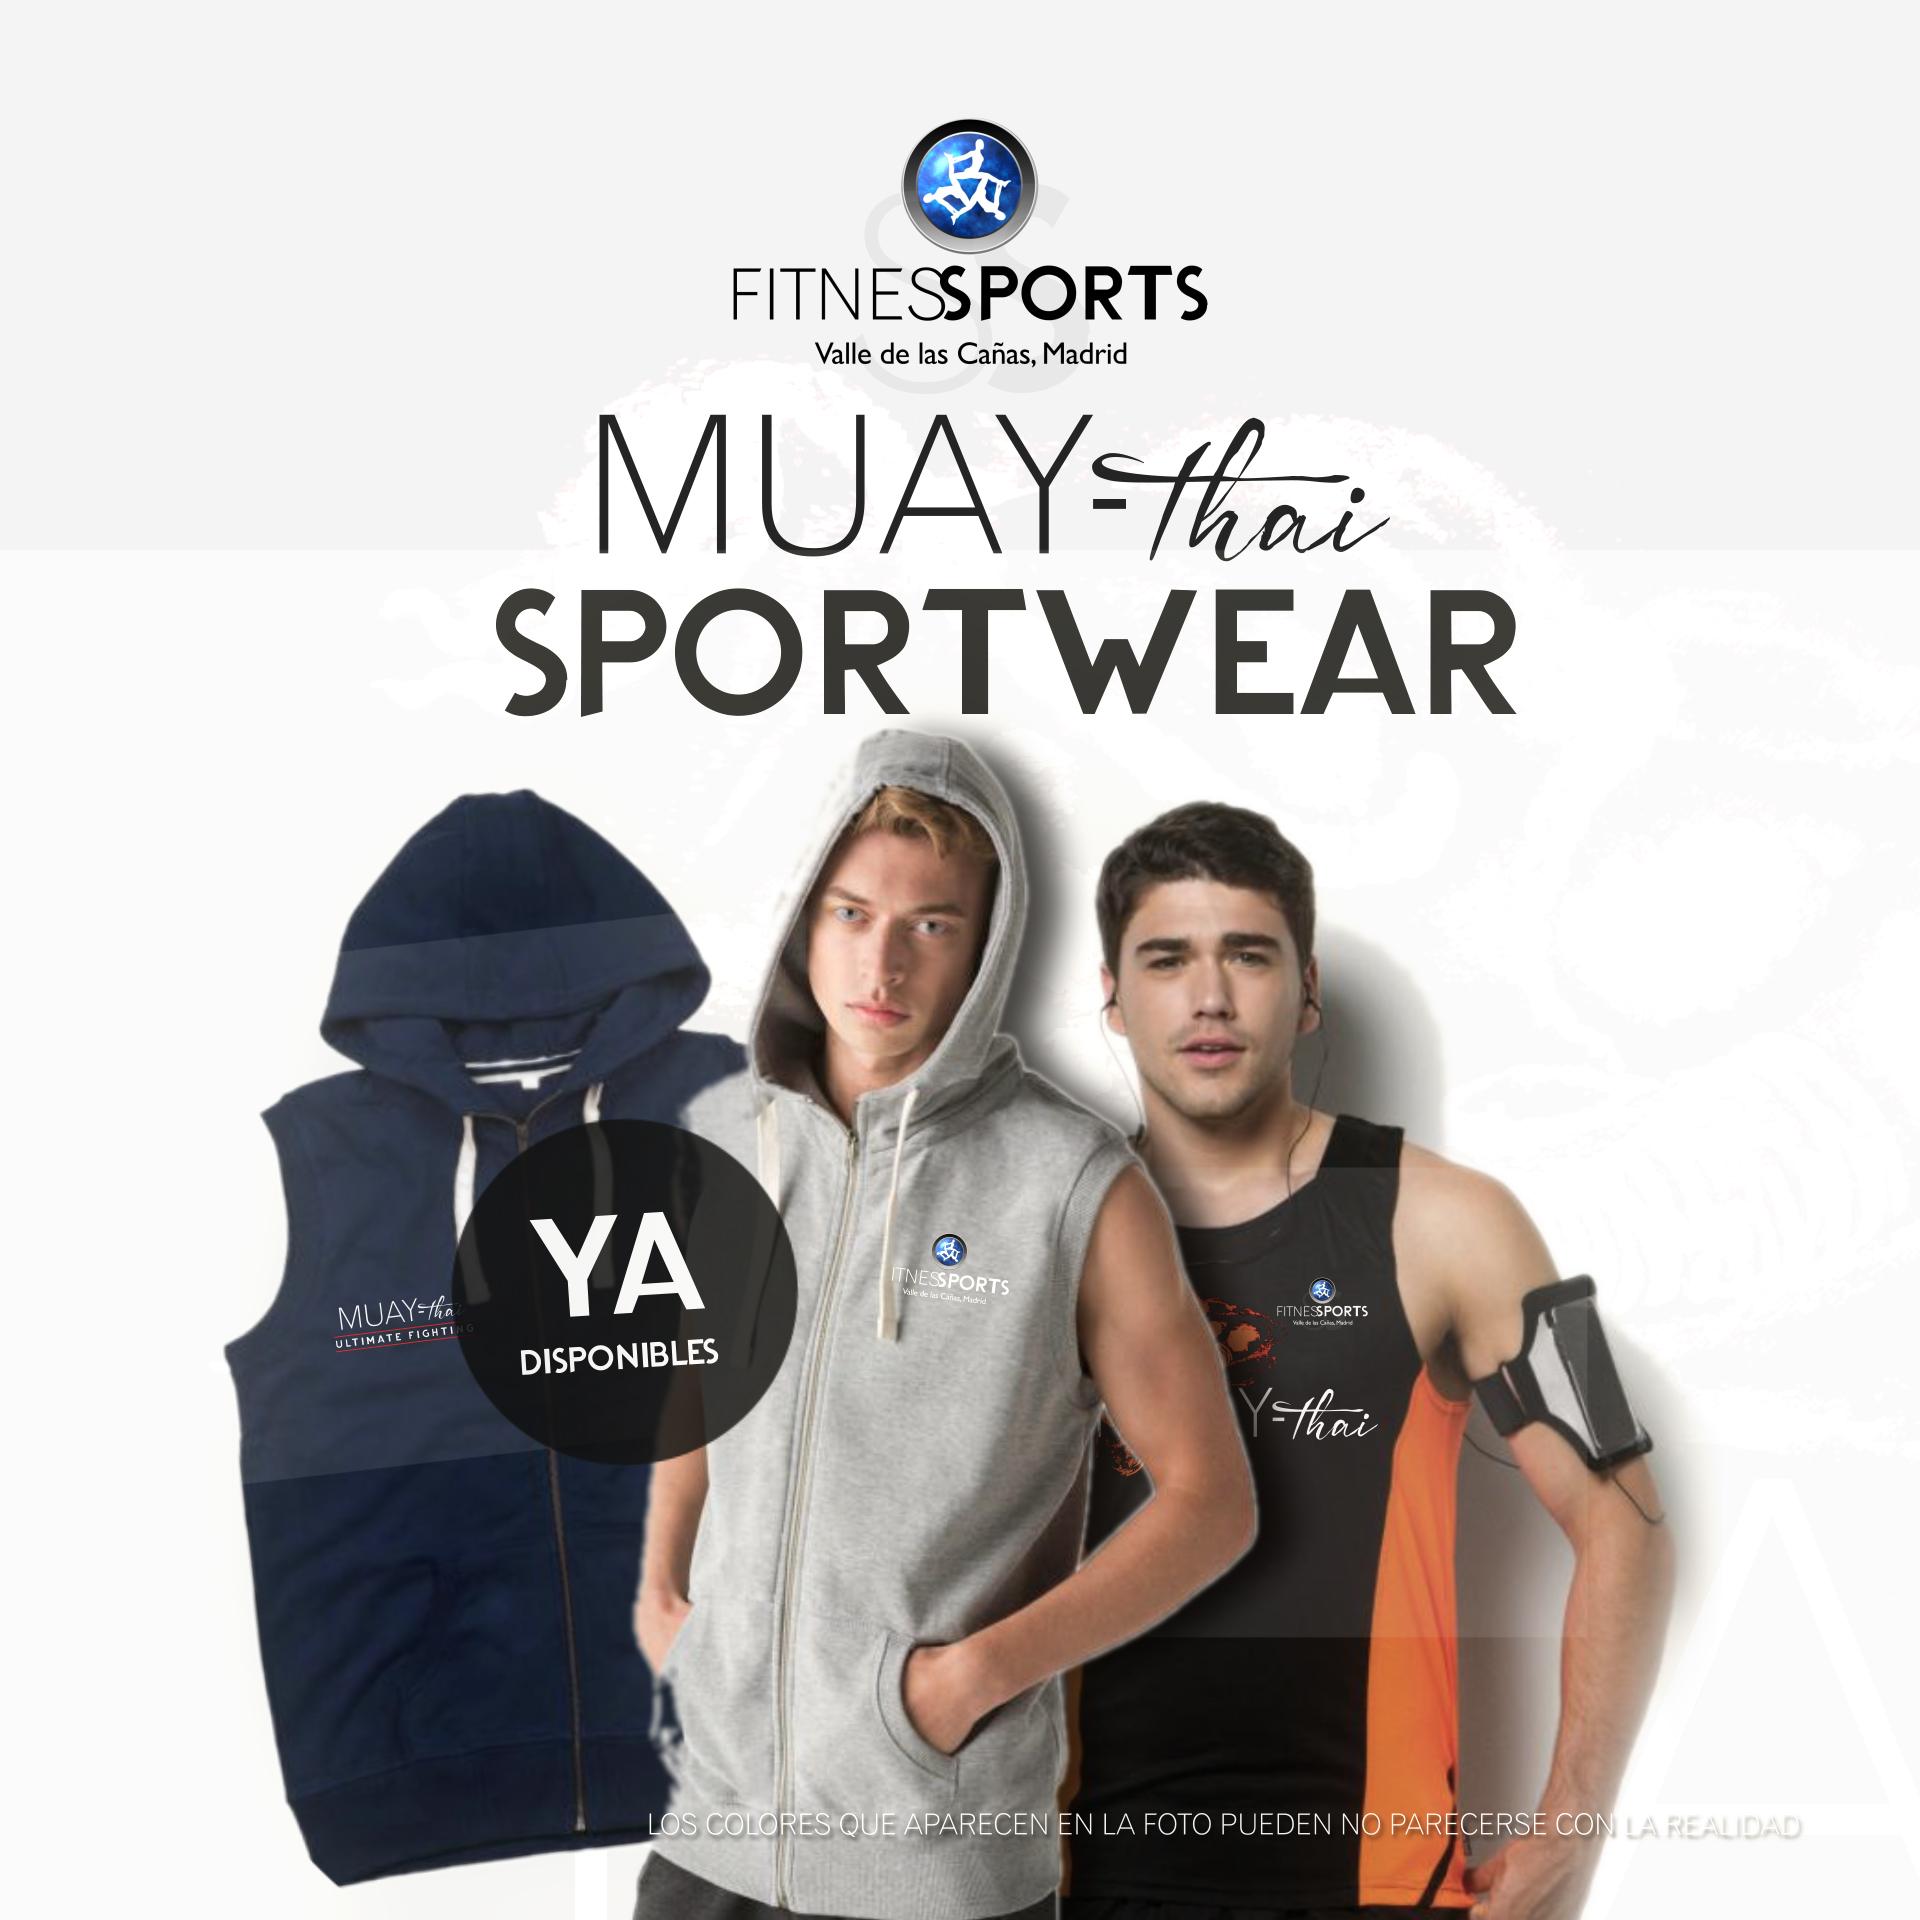 muay-thai-sportswear-camisetas-fitness-sports-valle-las-canas-box